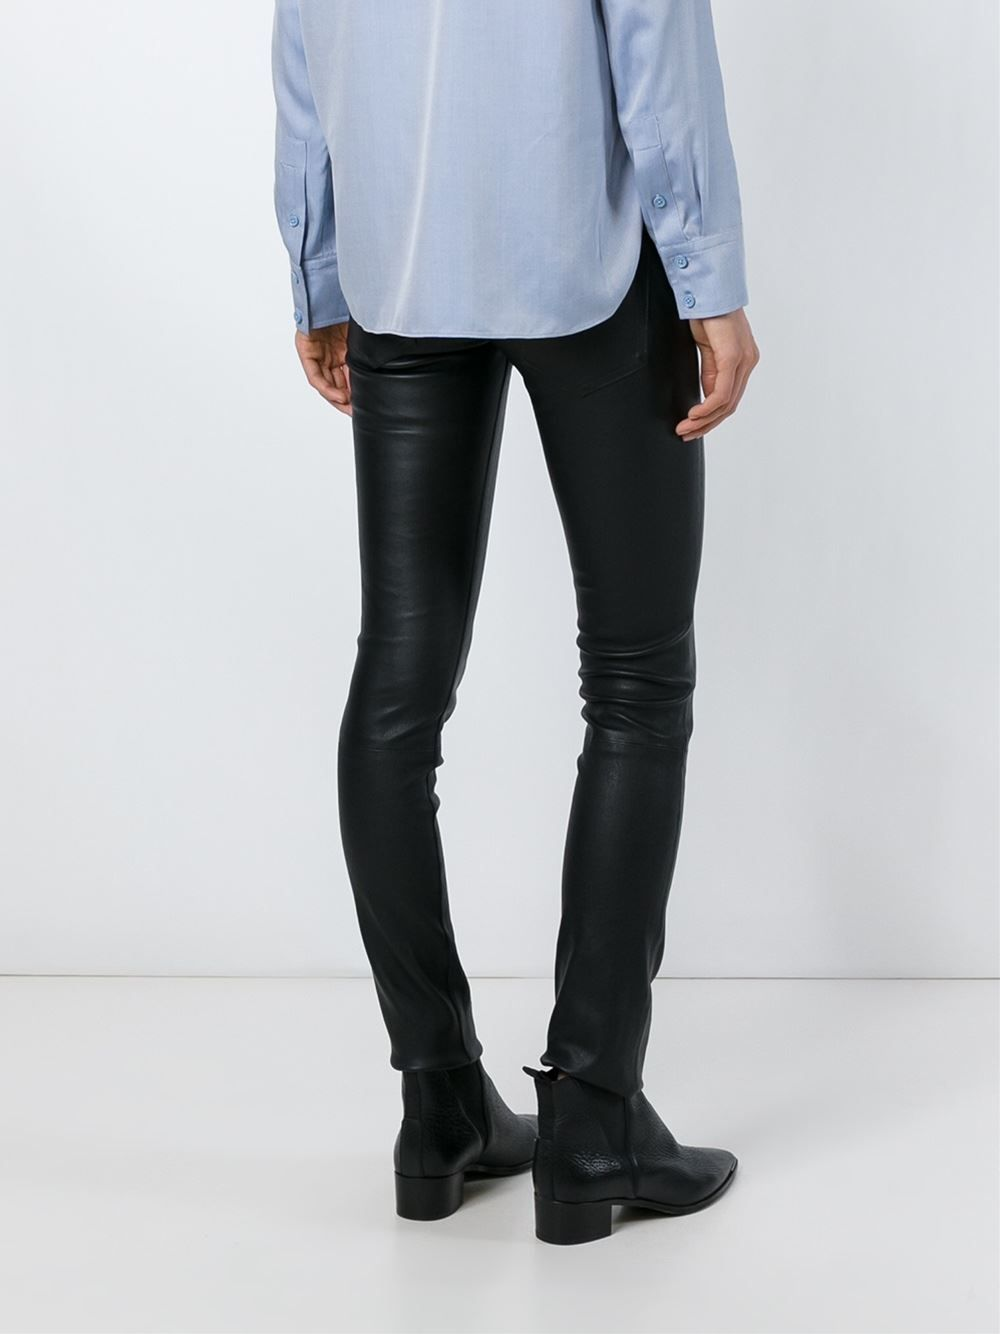 #helmutlang #leather #pants #jeans #woman #new #fashion www.jofre.eu